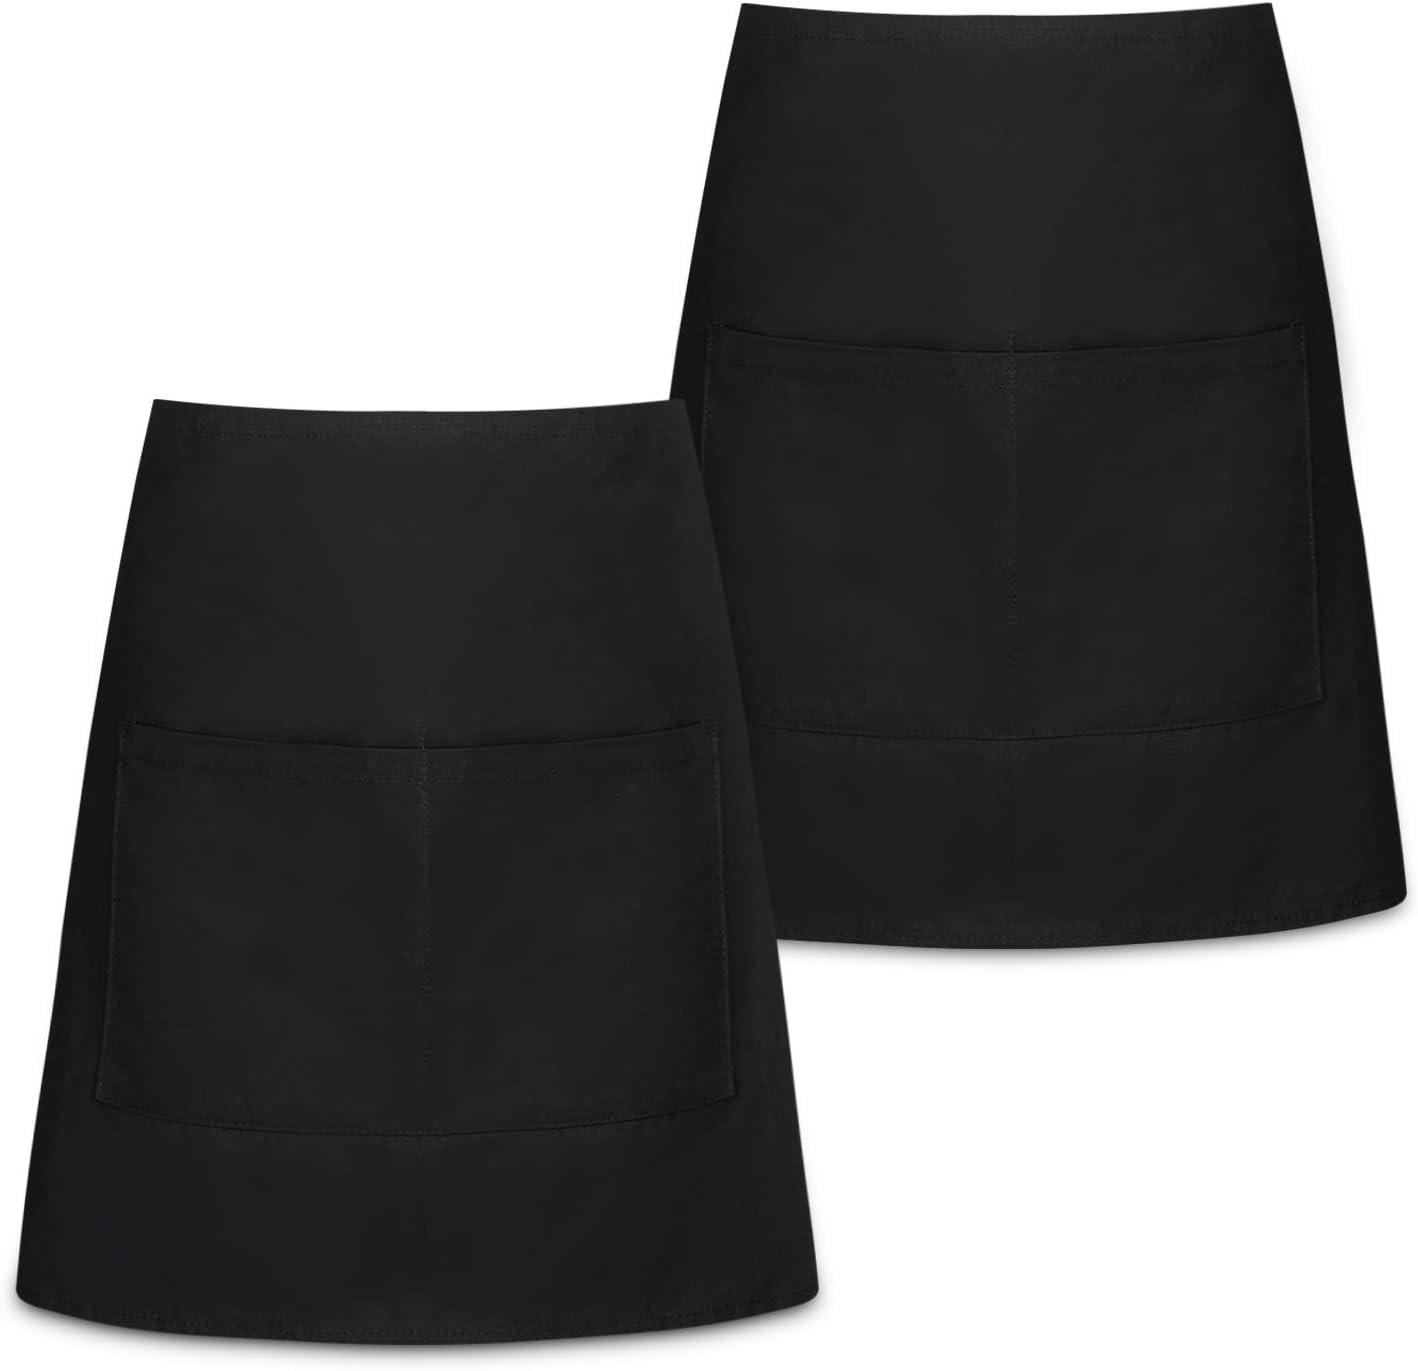 Syntus 2 Pack 2 Pockets 100% Cotton Waitress Waist Apron, 18 x 28 inch Black